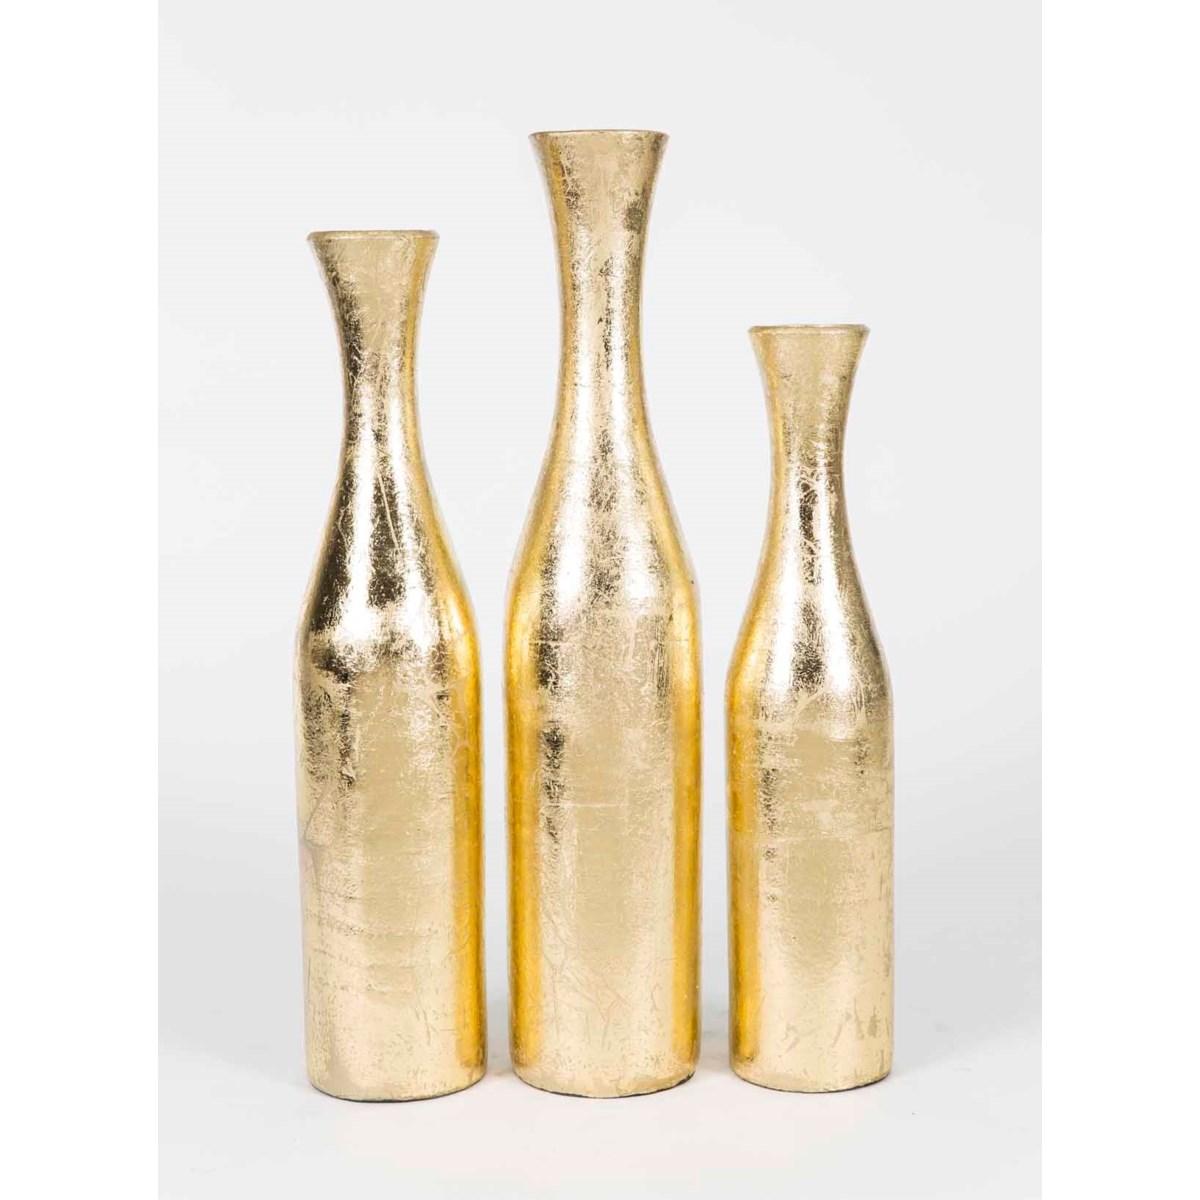 Set of 3 Bottles in Gold Finish